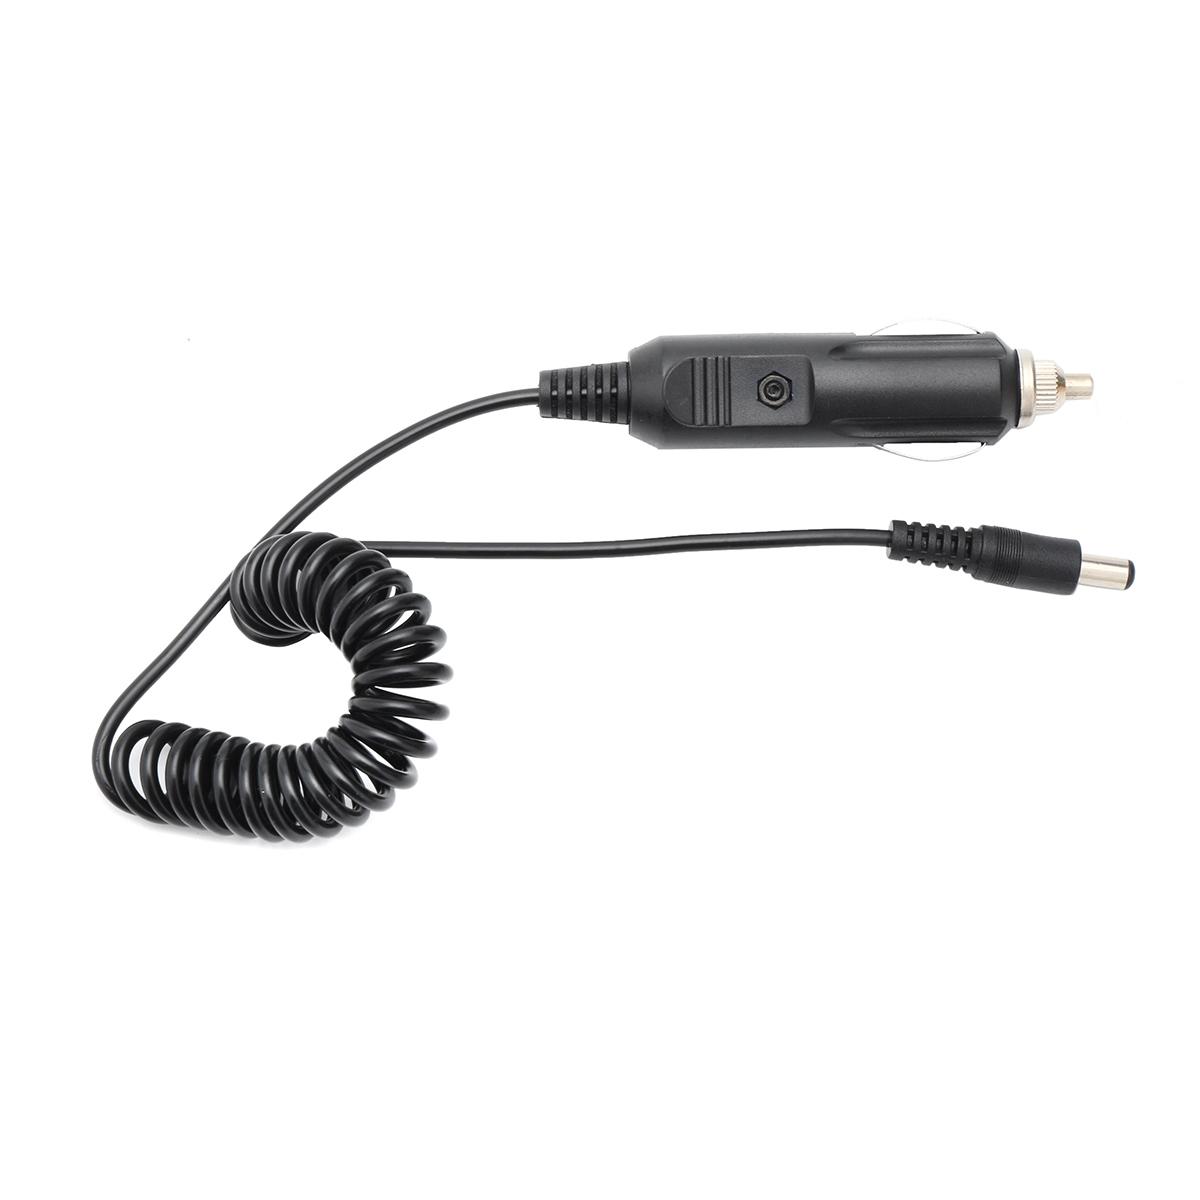 12v Car Cigarette Lighter Socket Power Supply Charger Cable Male Plug